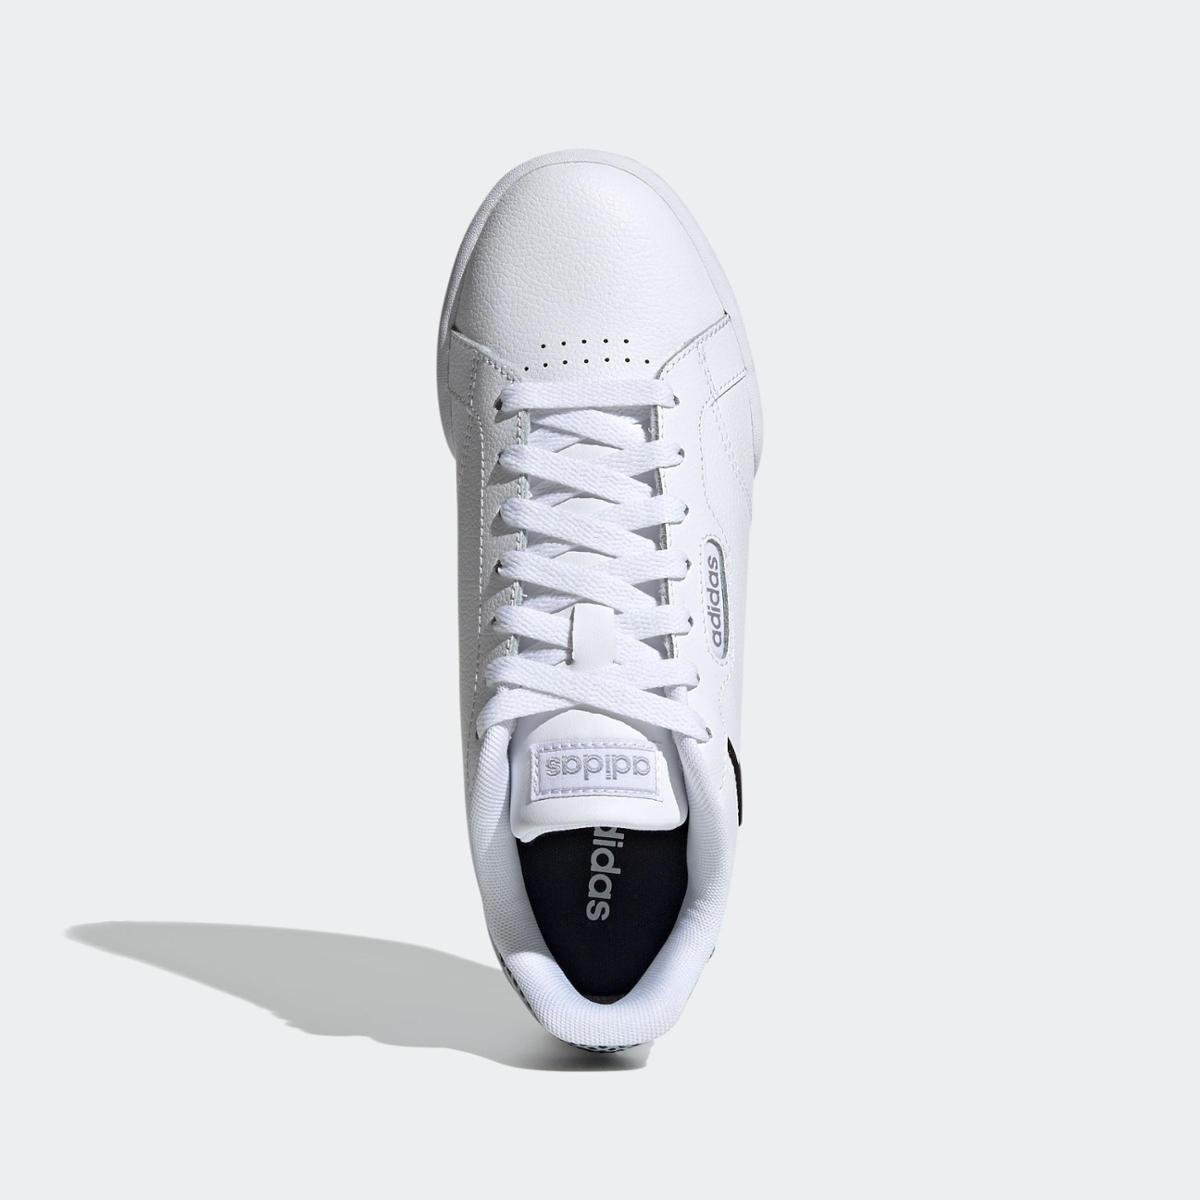 Tênis Feminino Adidas FY8884 ROGUERA